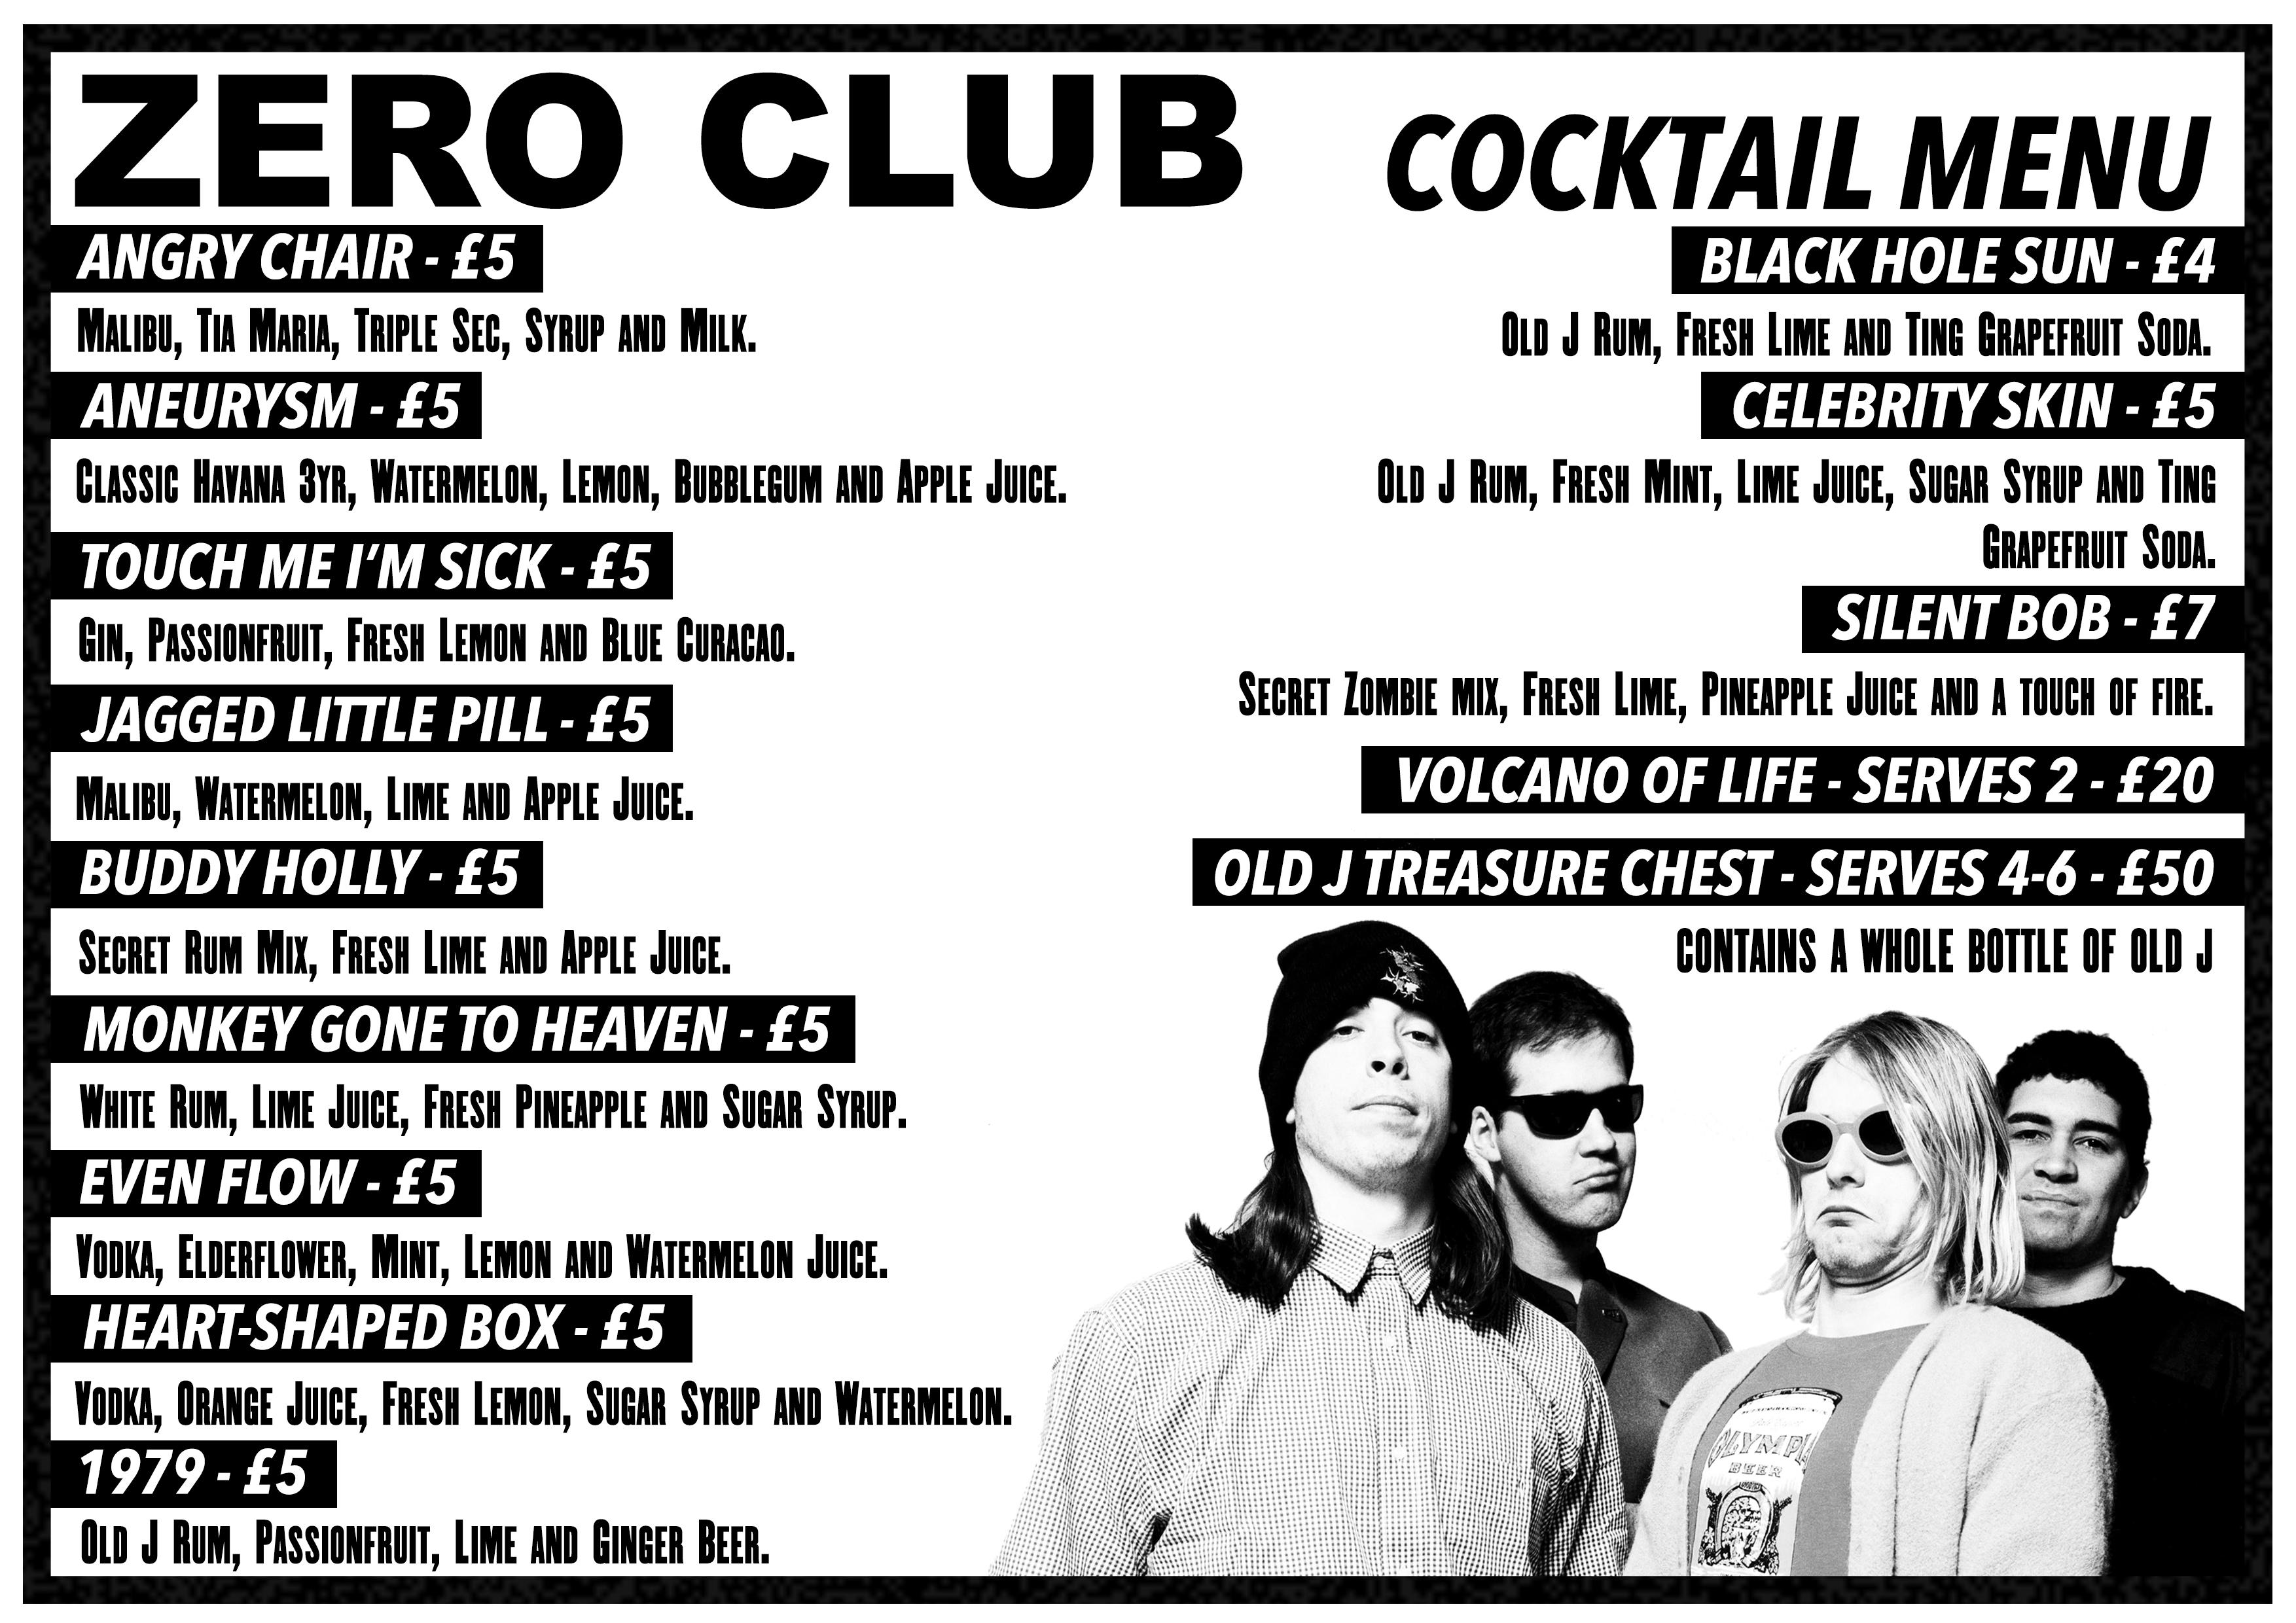 Zero Club Cocktail Menu